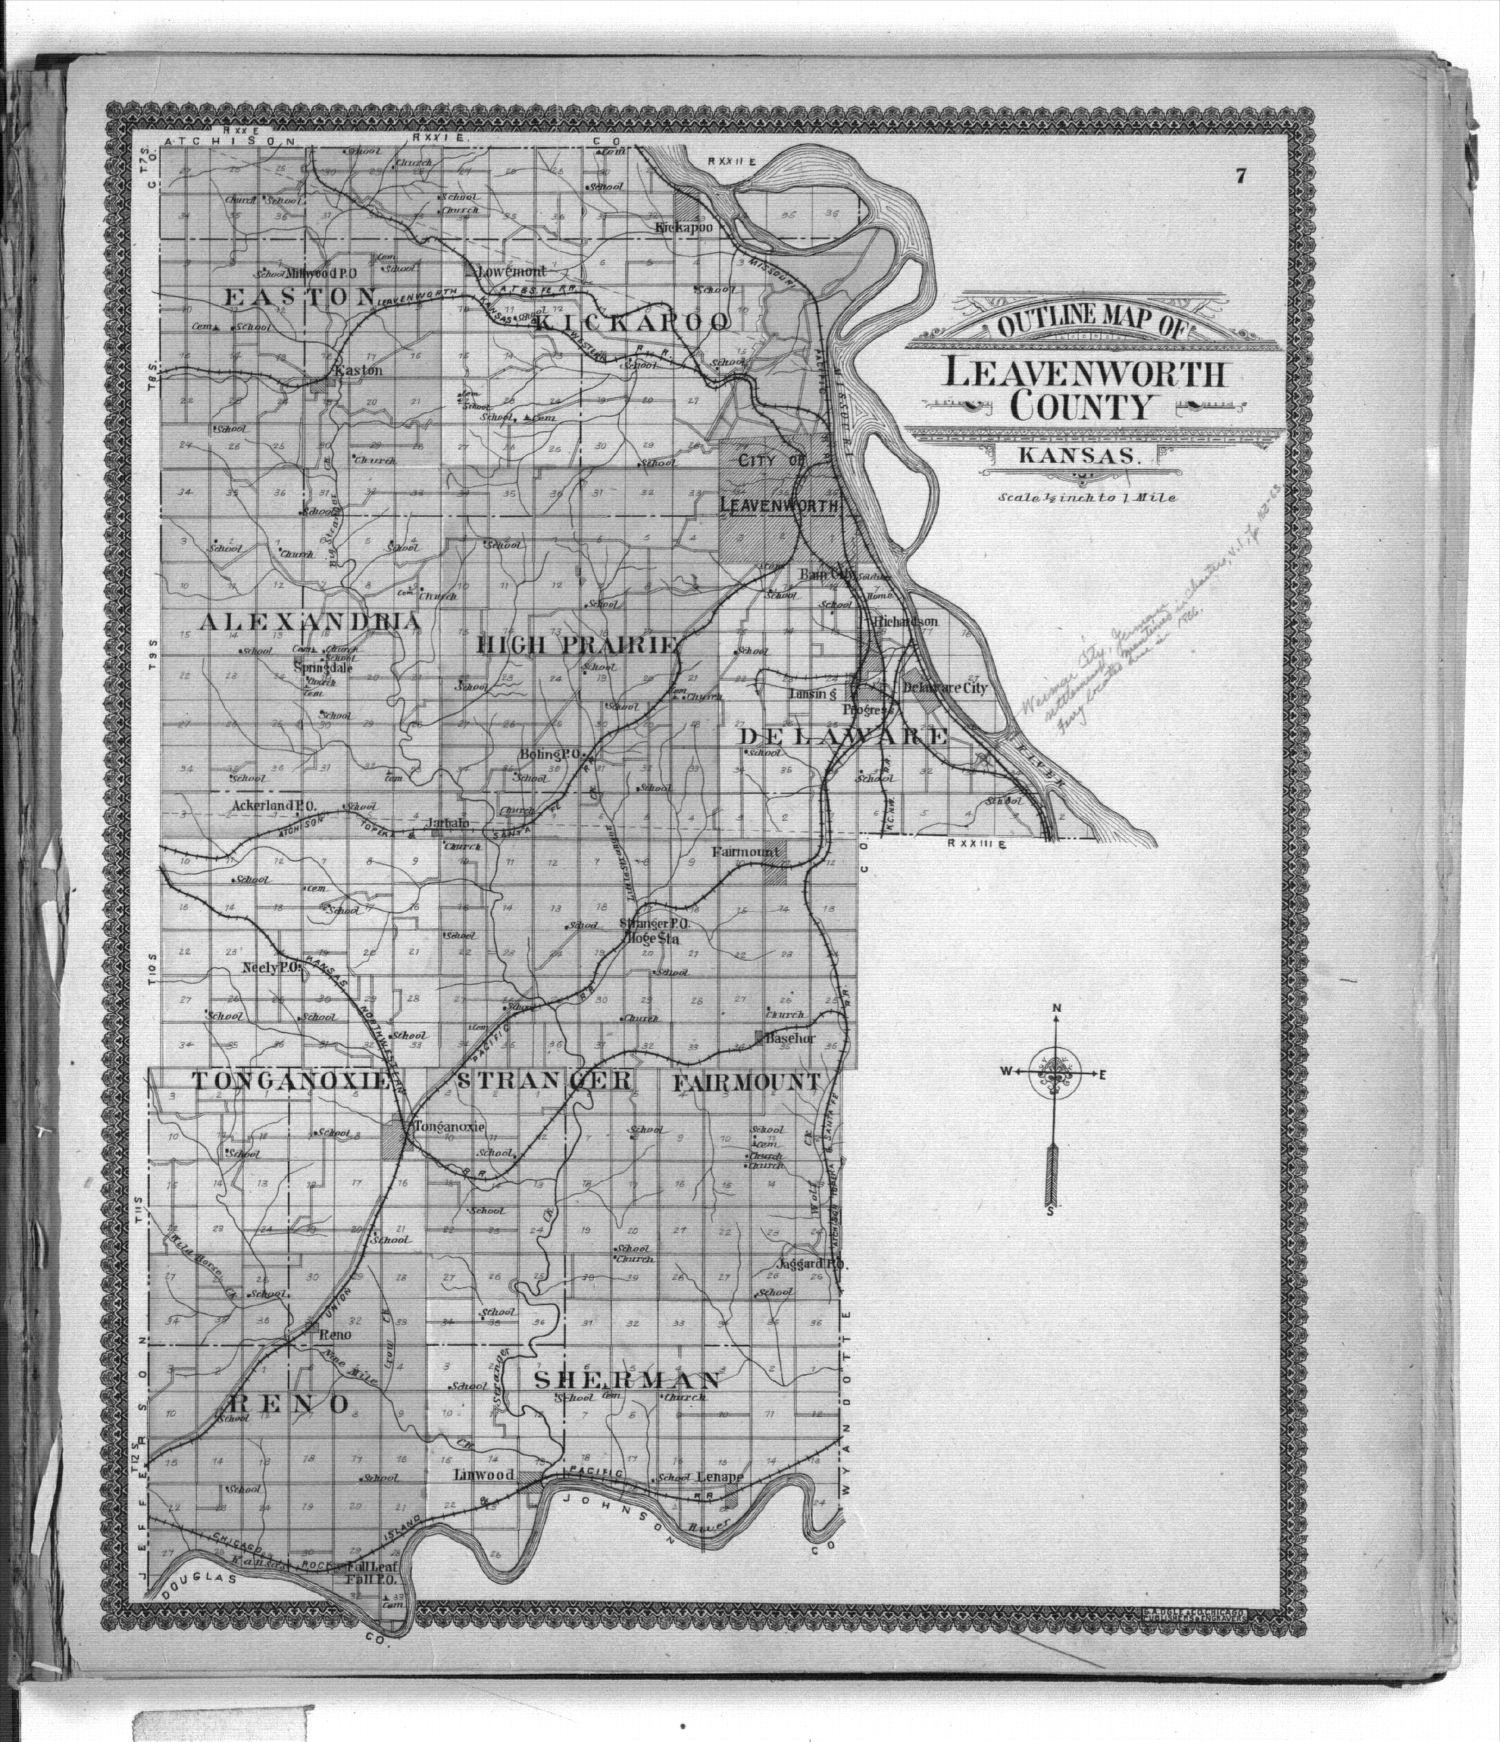 Standard atlas of Leavenworth County, Kansas - 7